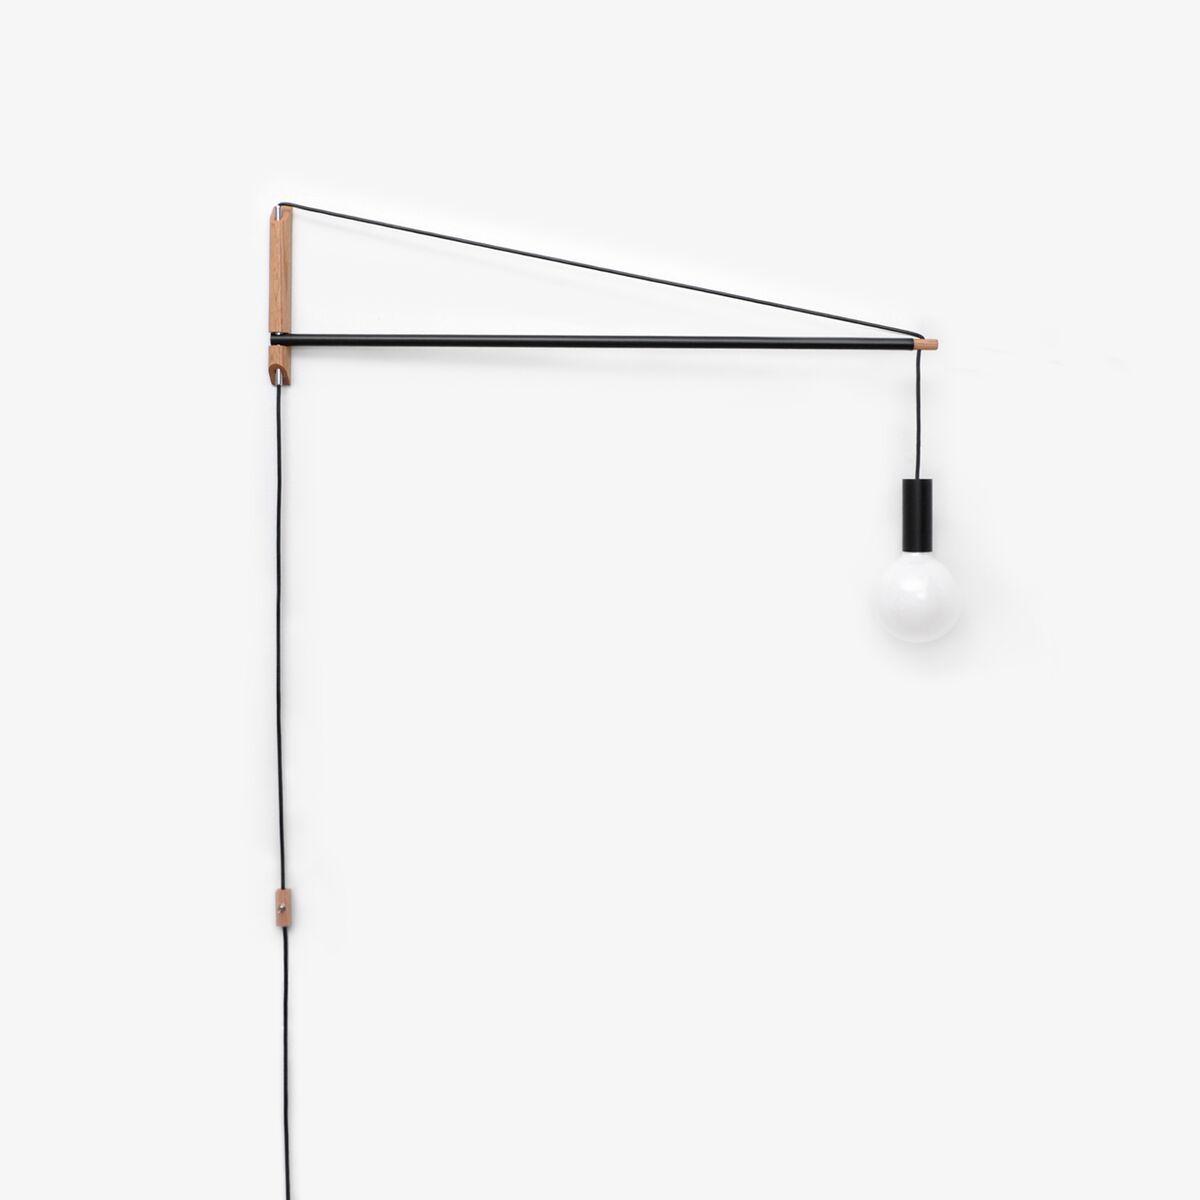 Crane Swing Arm Wall Light By Andrew Neyer Cl 2 Blk In 2020 Crane Light Swing Arm Wall Light Wall Lights